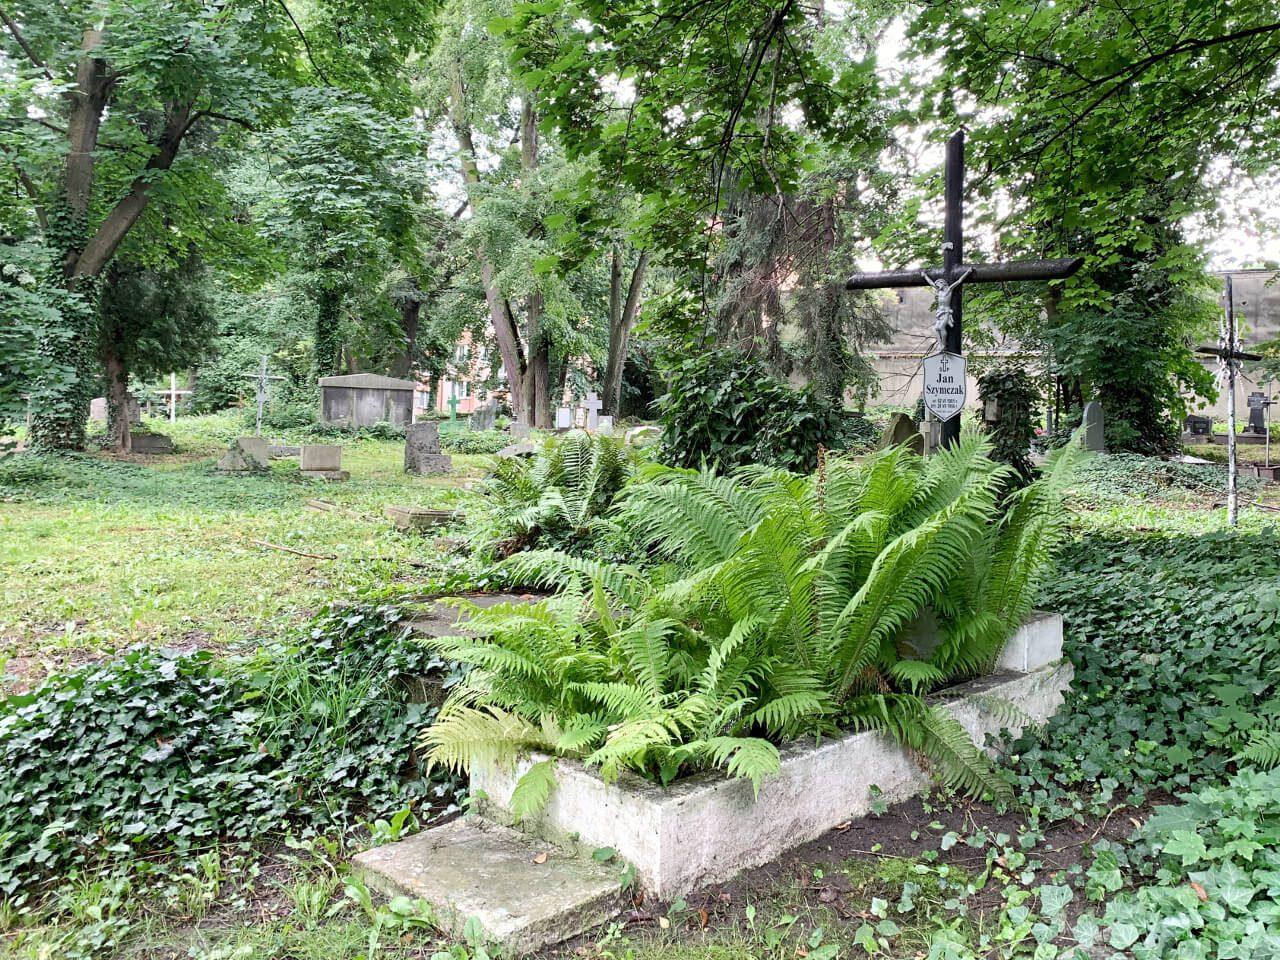 Cmentarz w Ząbkowicach Śląskich Frankenstein